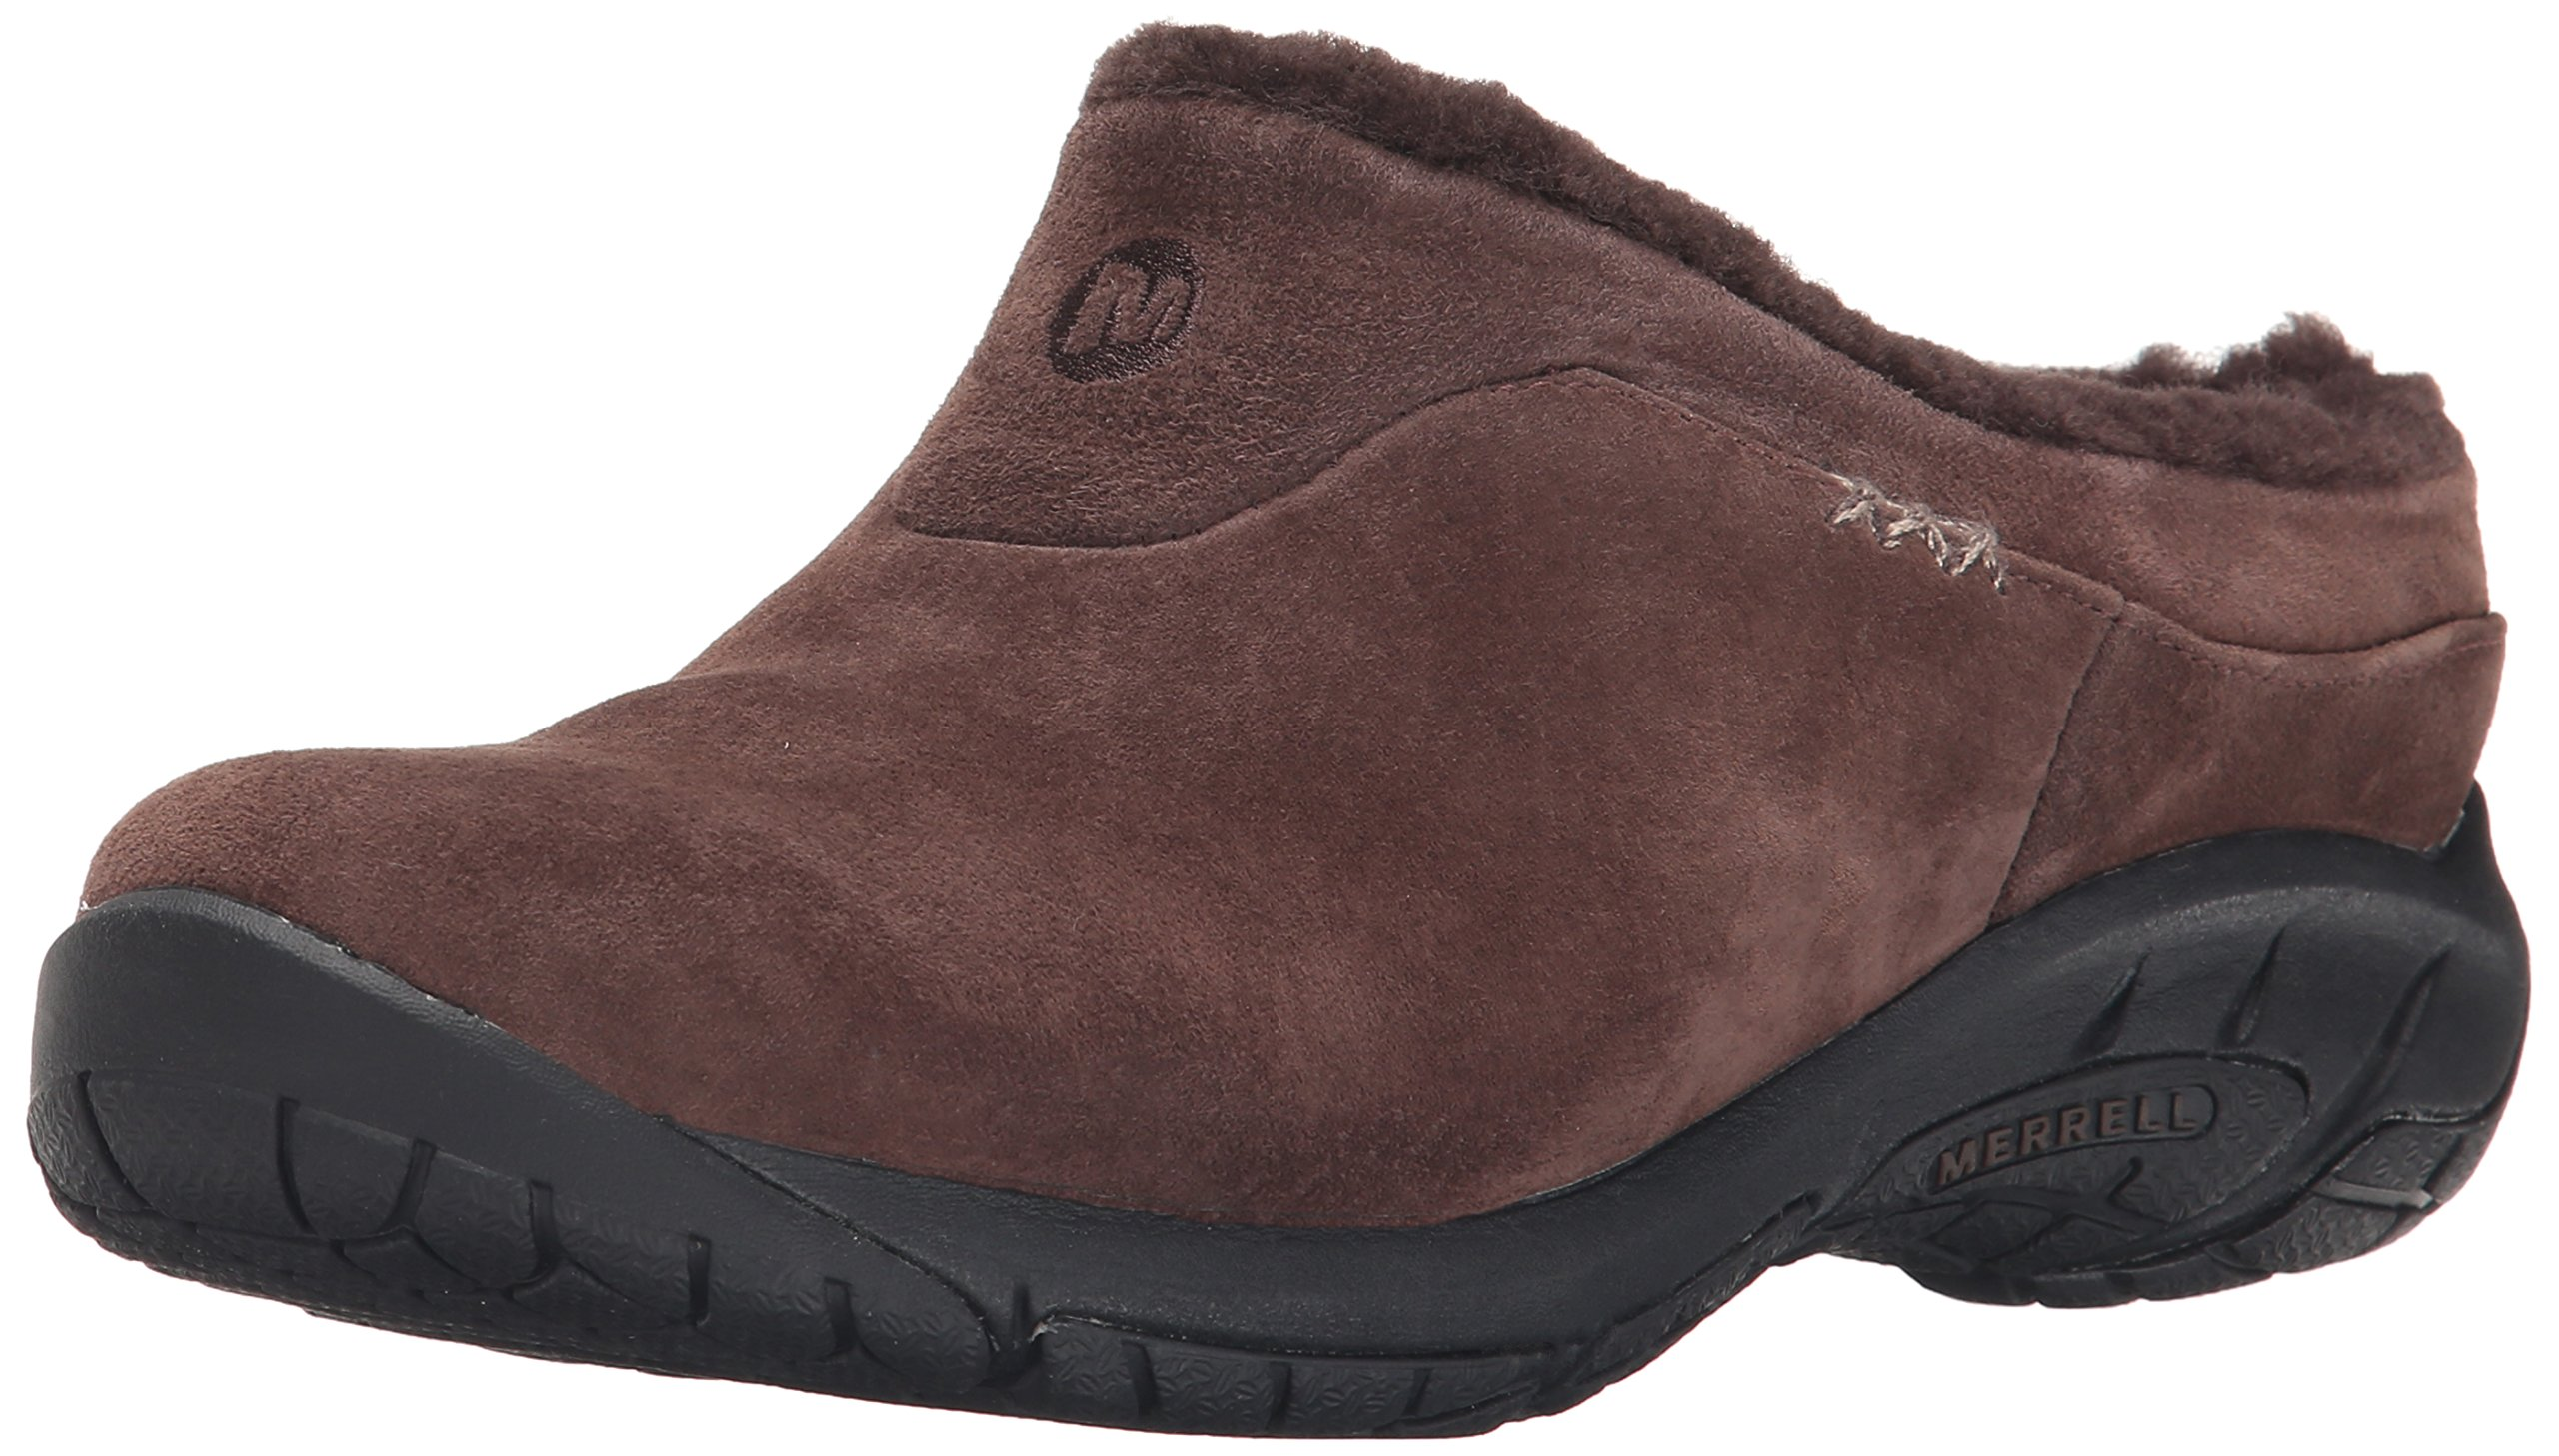 Merrell Women's Encore Ice Slip-On Shoe, Chocolate Brown, 5 M US